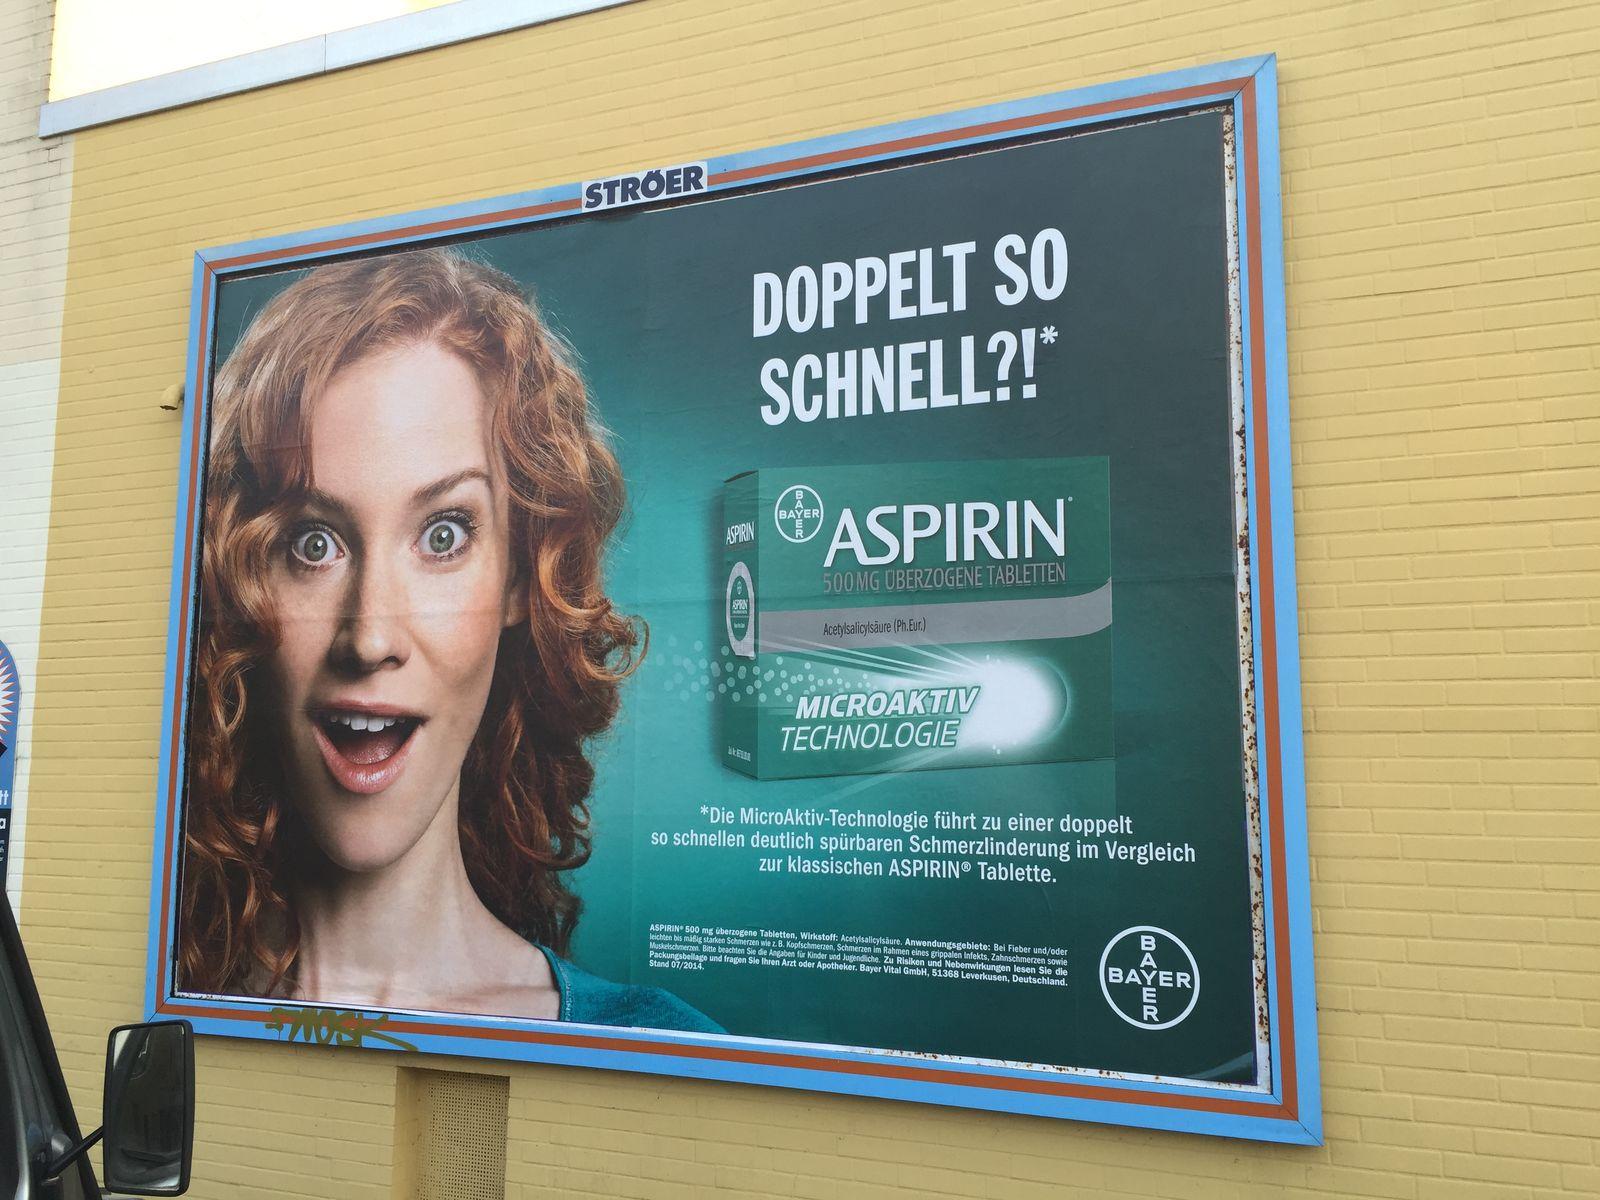 Aspirin / Werbung